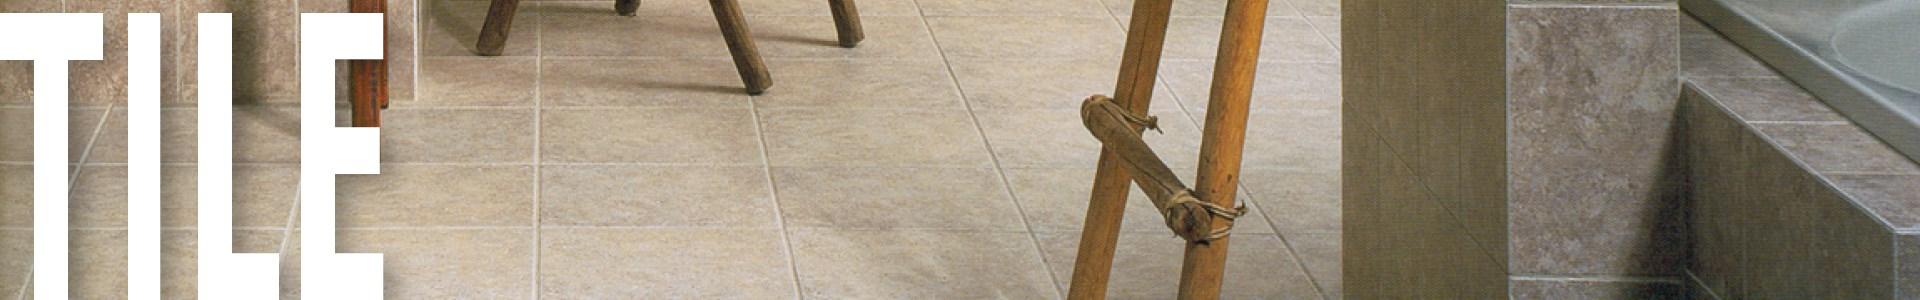 Boulevard Flooring and Design - Tile